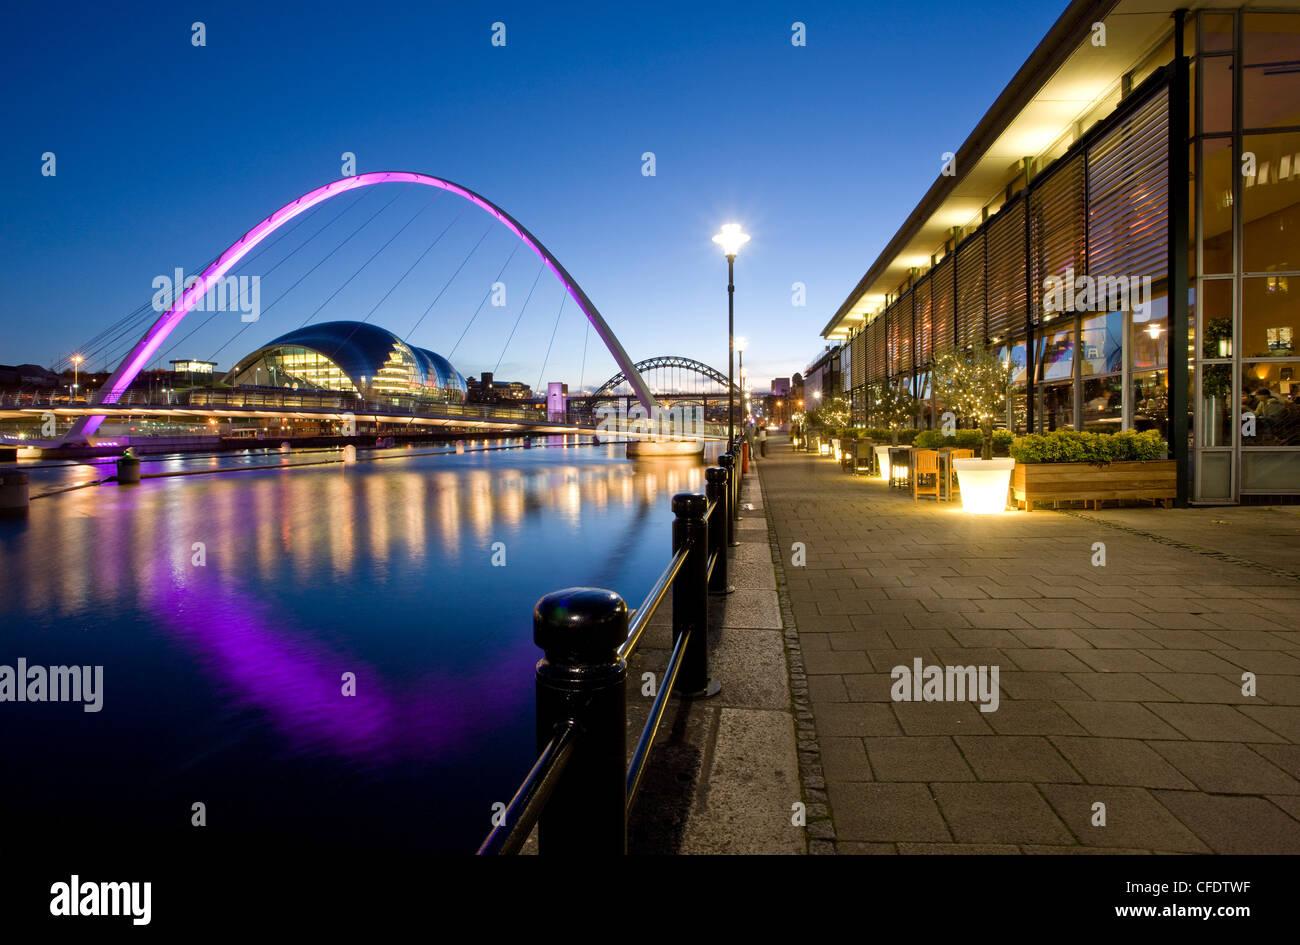 Newcastle Quayside, Gateshead Millennium Bridge and the Arched Bridge, Newcastle-upon-Tyne, Tyne and Wear, England, Stock Photo